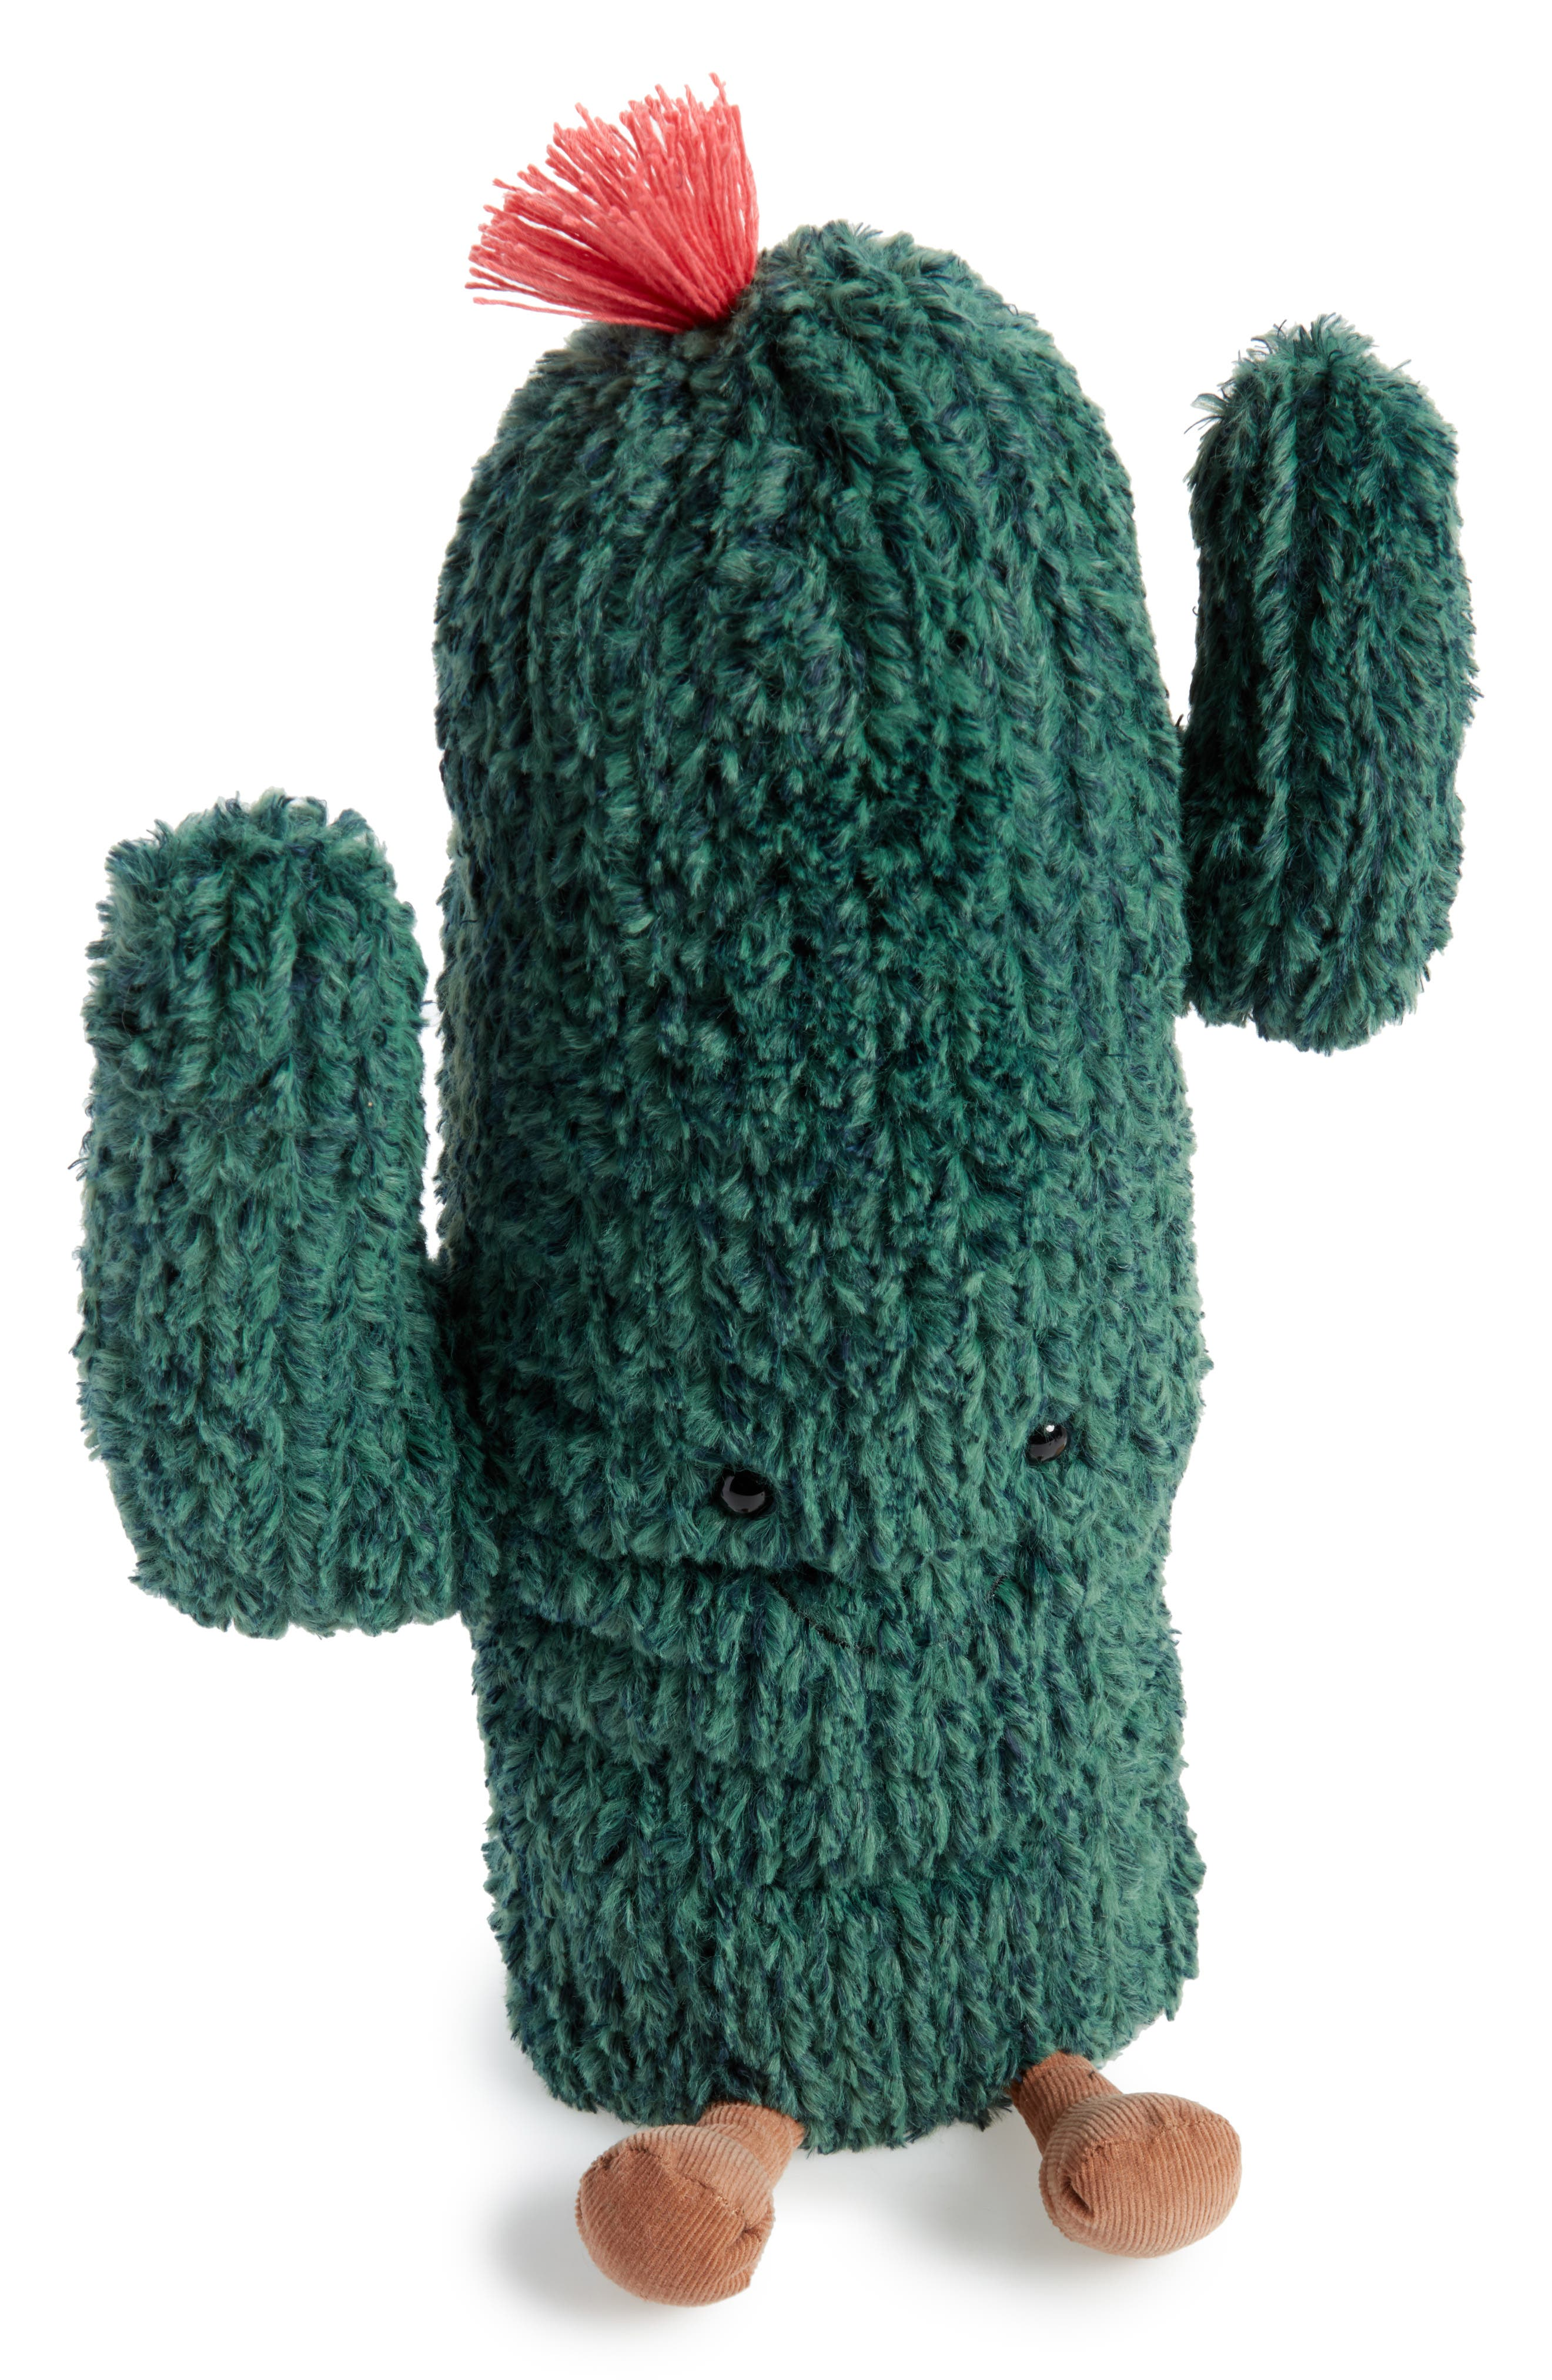 Infant Jellycat Amuseable Cactus Stuffed Toy